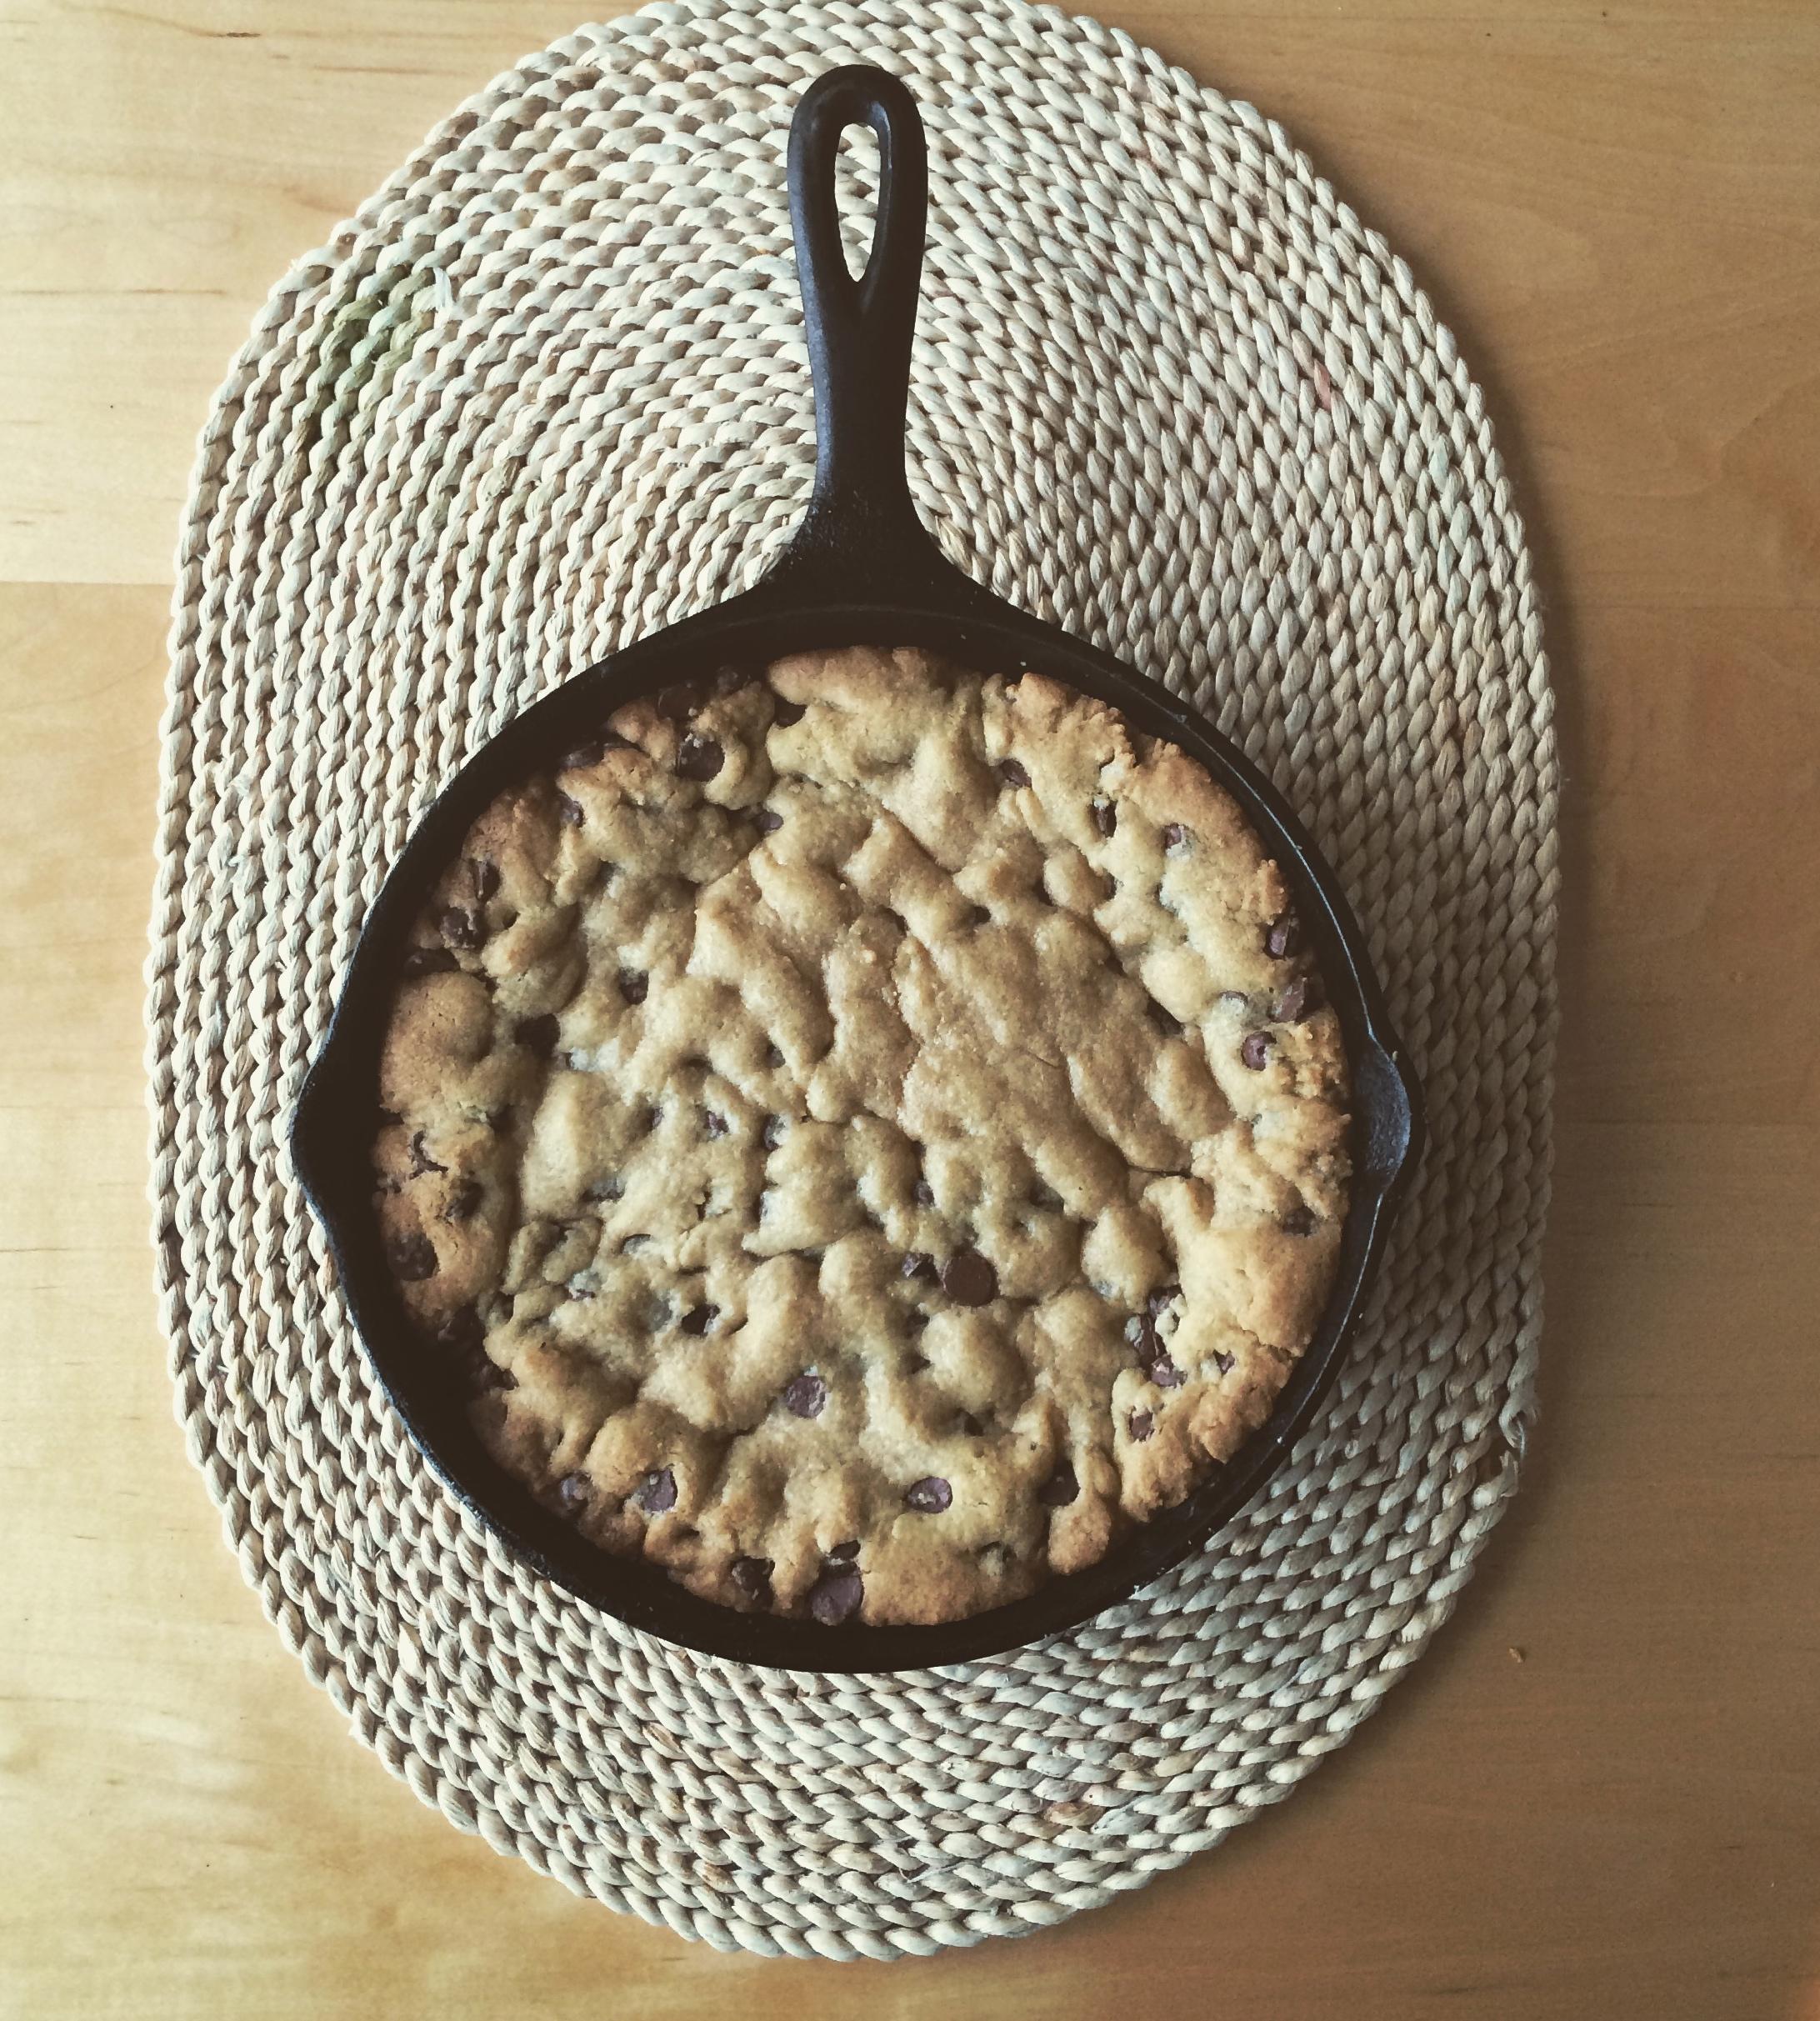 Image 1 skillet cake